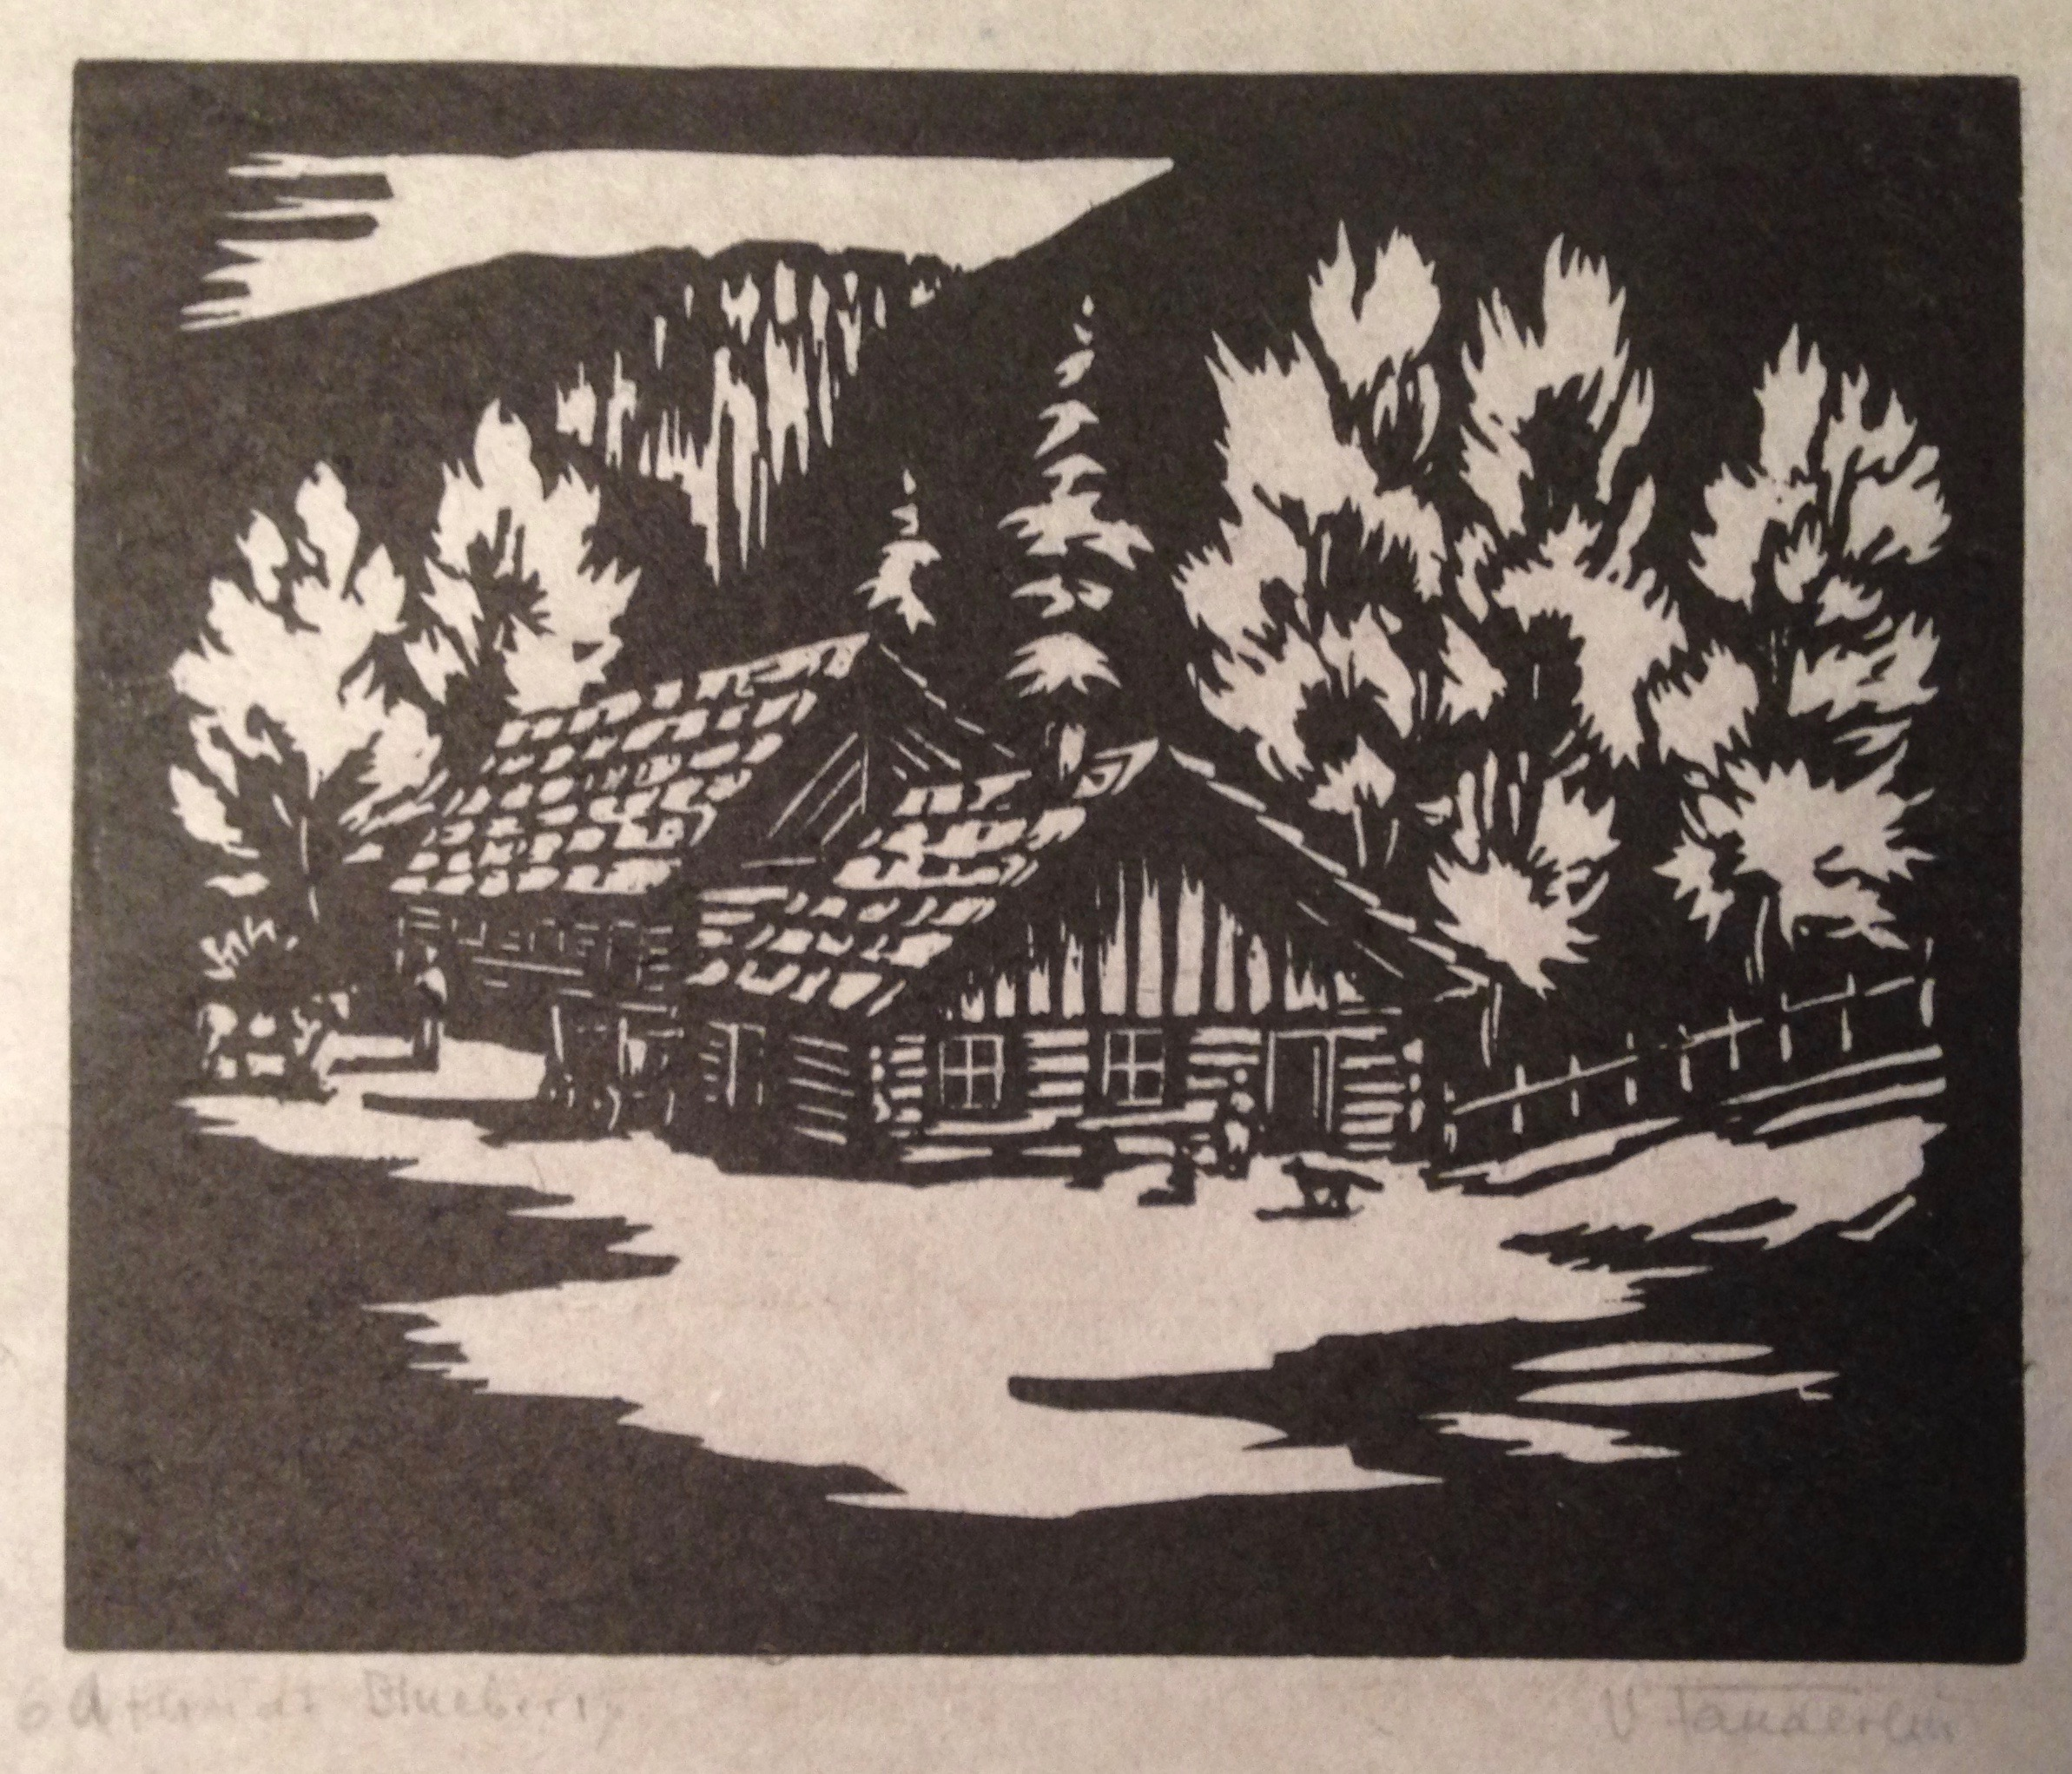 Velen Fanderlik, A Farm at Blueberry